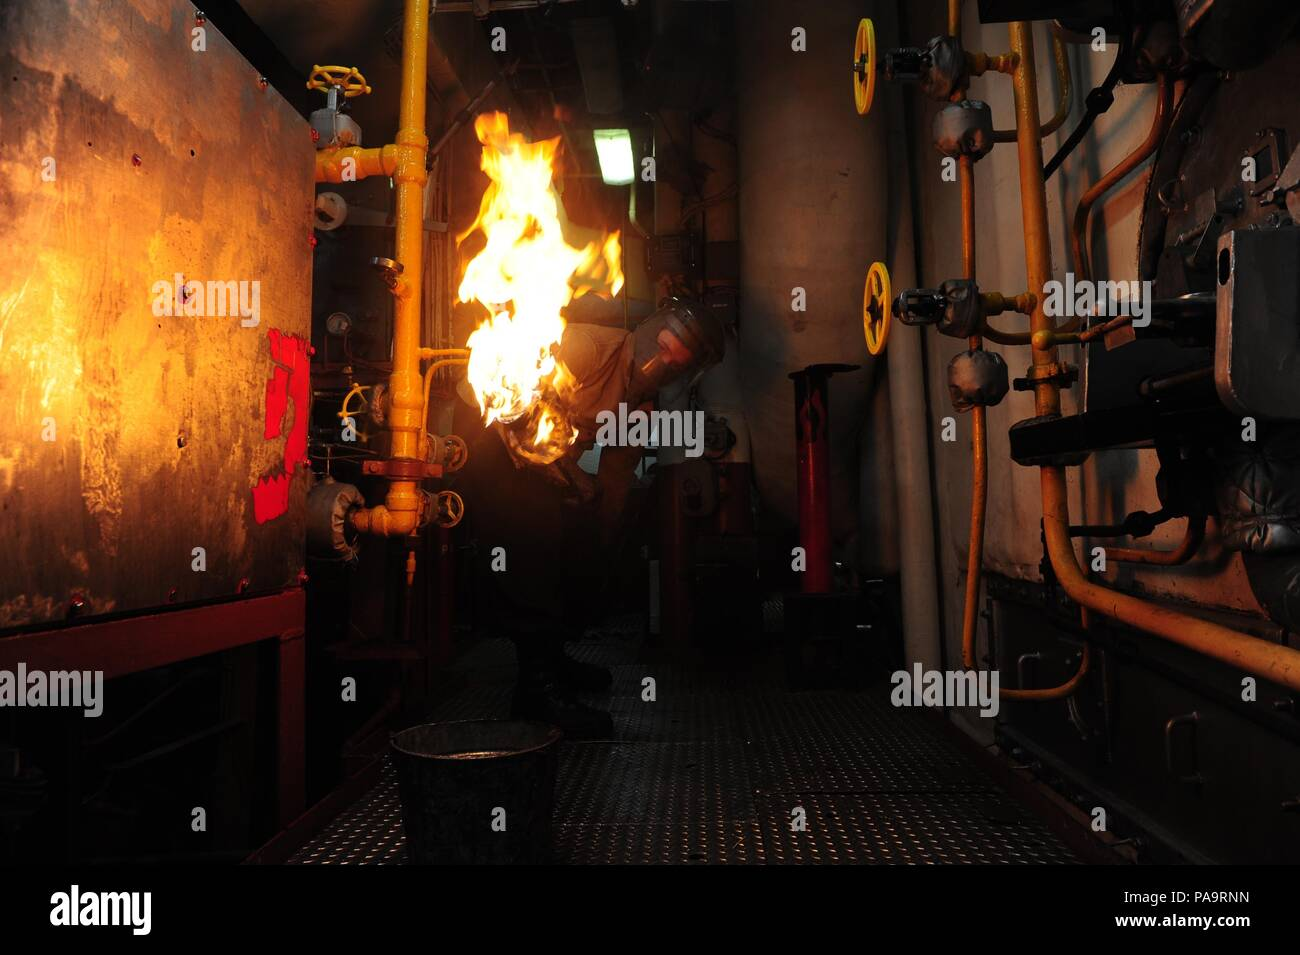 160303-N-VD165-029 PACIFIC OCEAN (March 3 2016) Fireman & Boiler Torch Stock Photos u0026 Boiler Torch Stock Images - Alamy